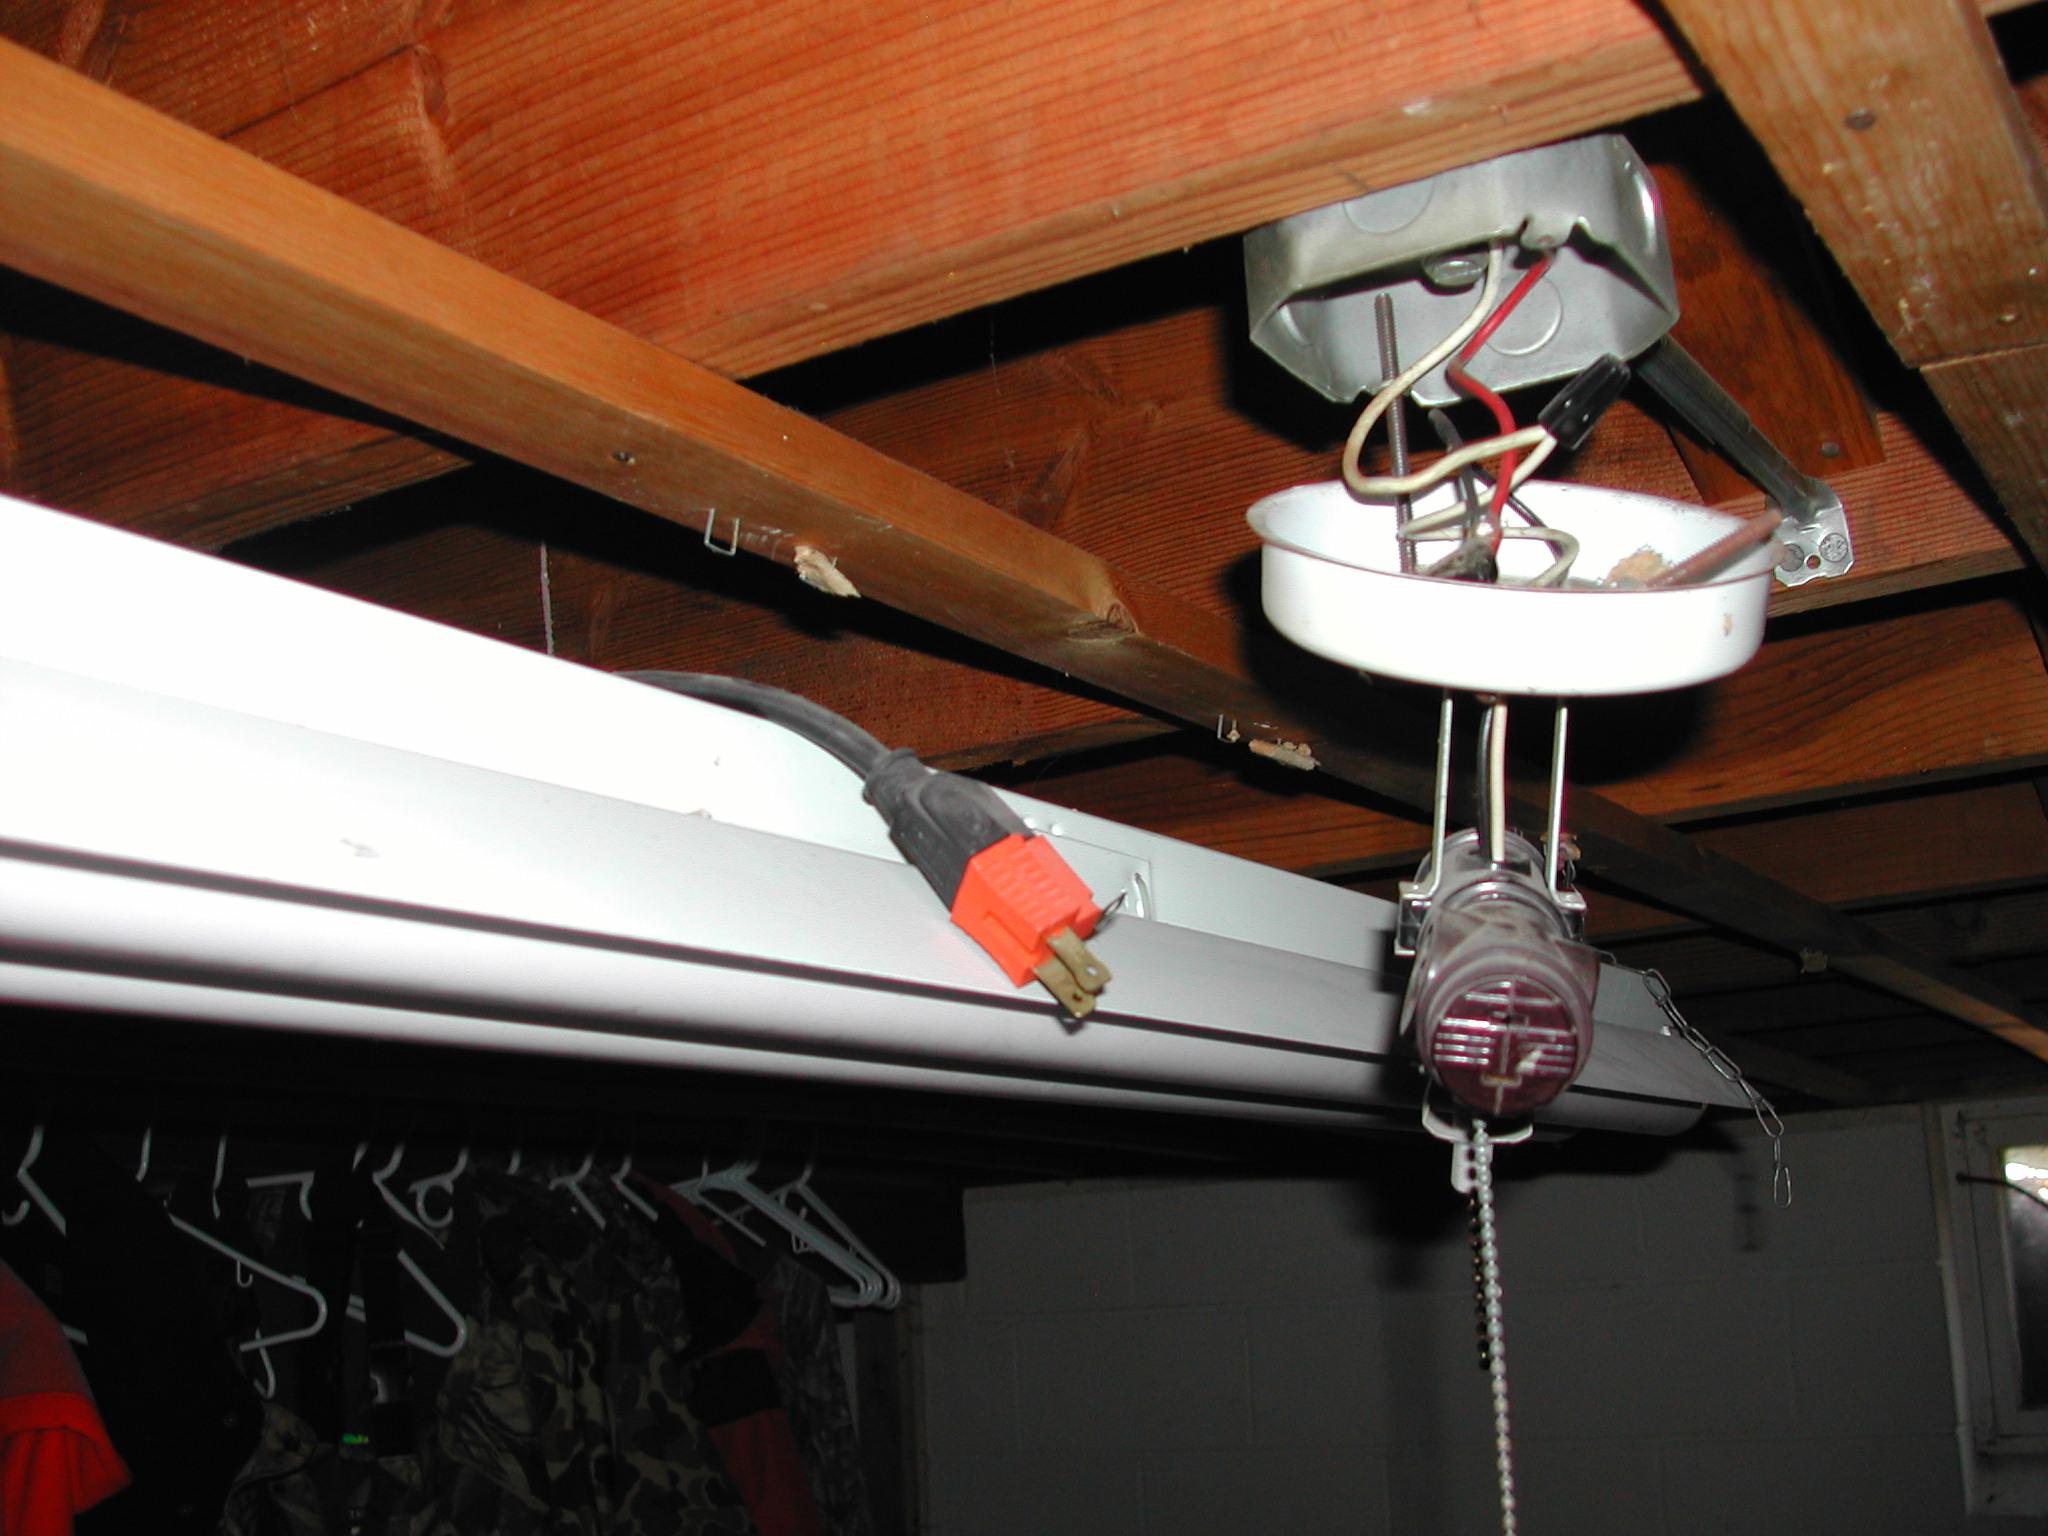 Improper wiring